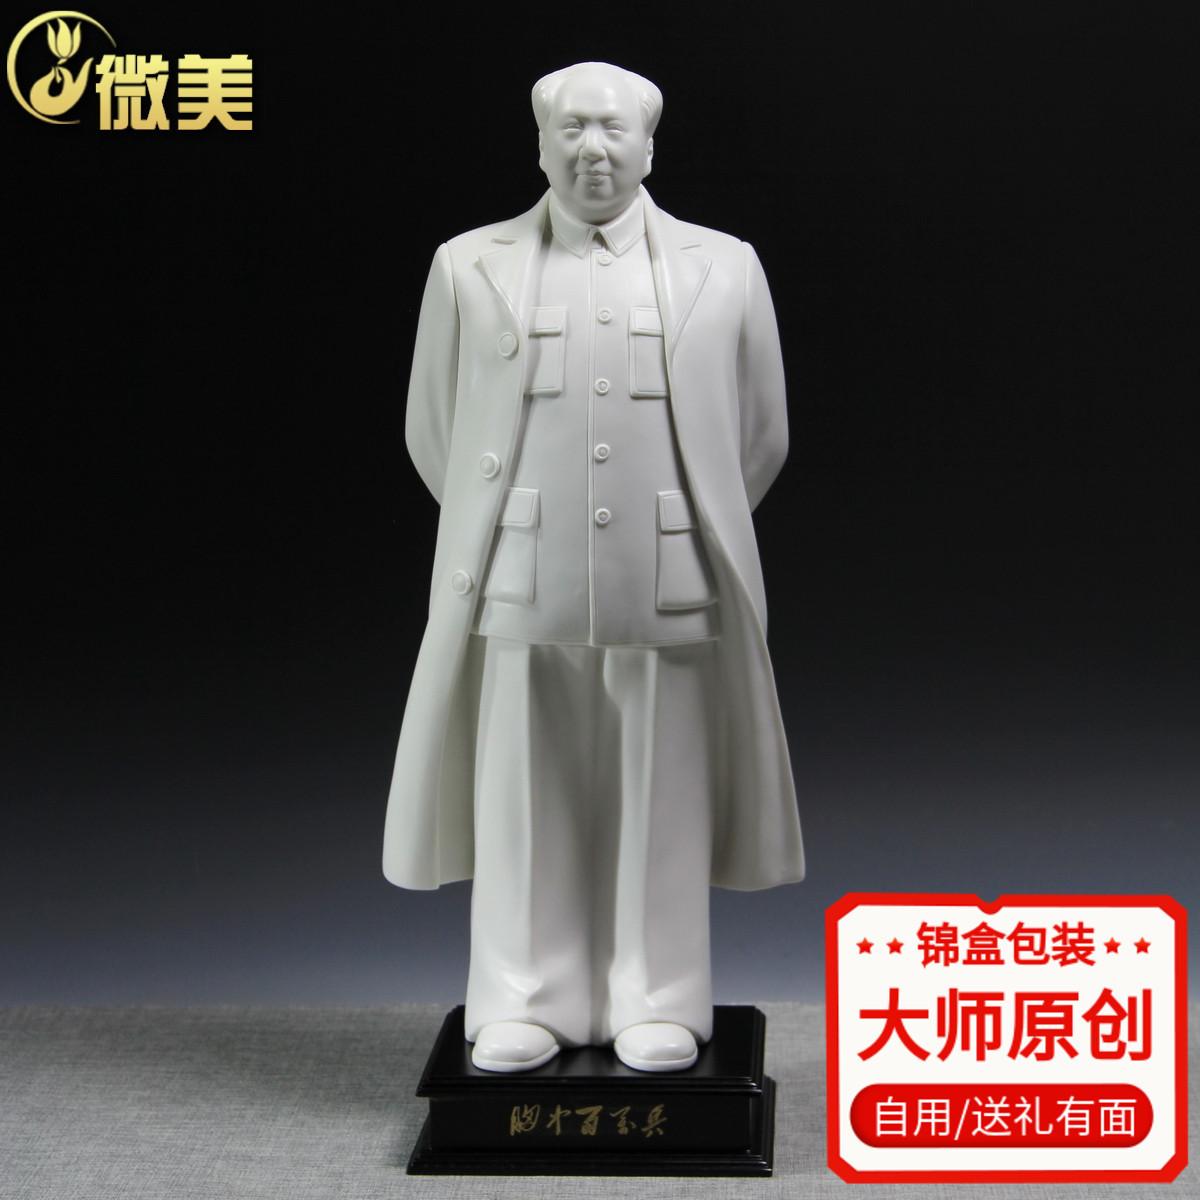 Коллекции китайской партии Артикул 597511233292